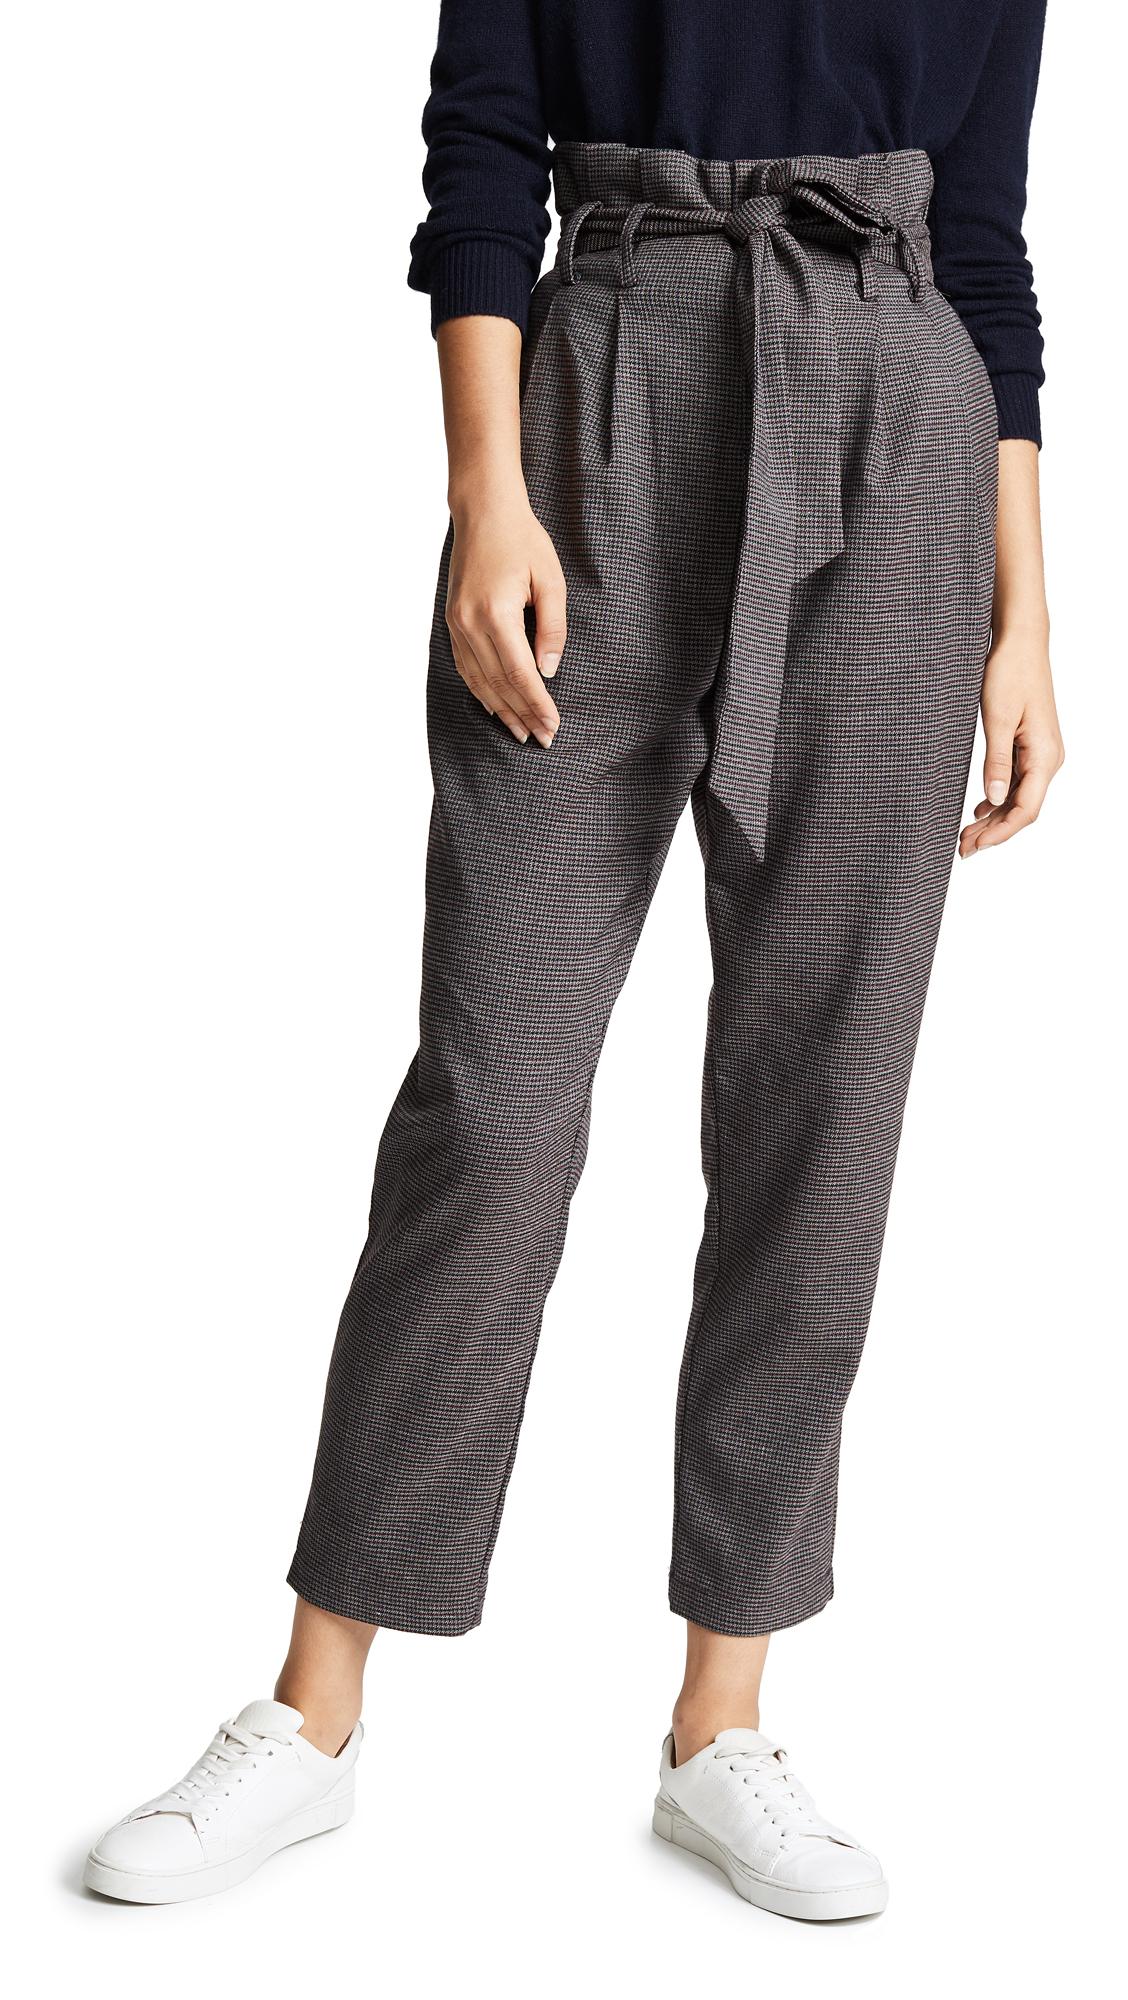 LOST + WANDER Lone Star Tie Pants in Grey Multi